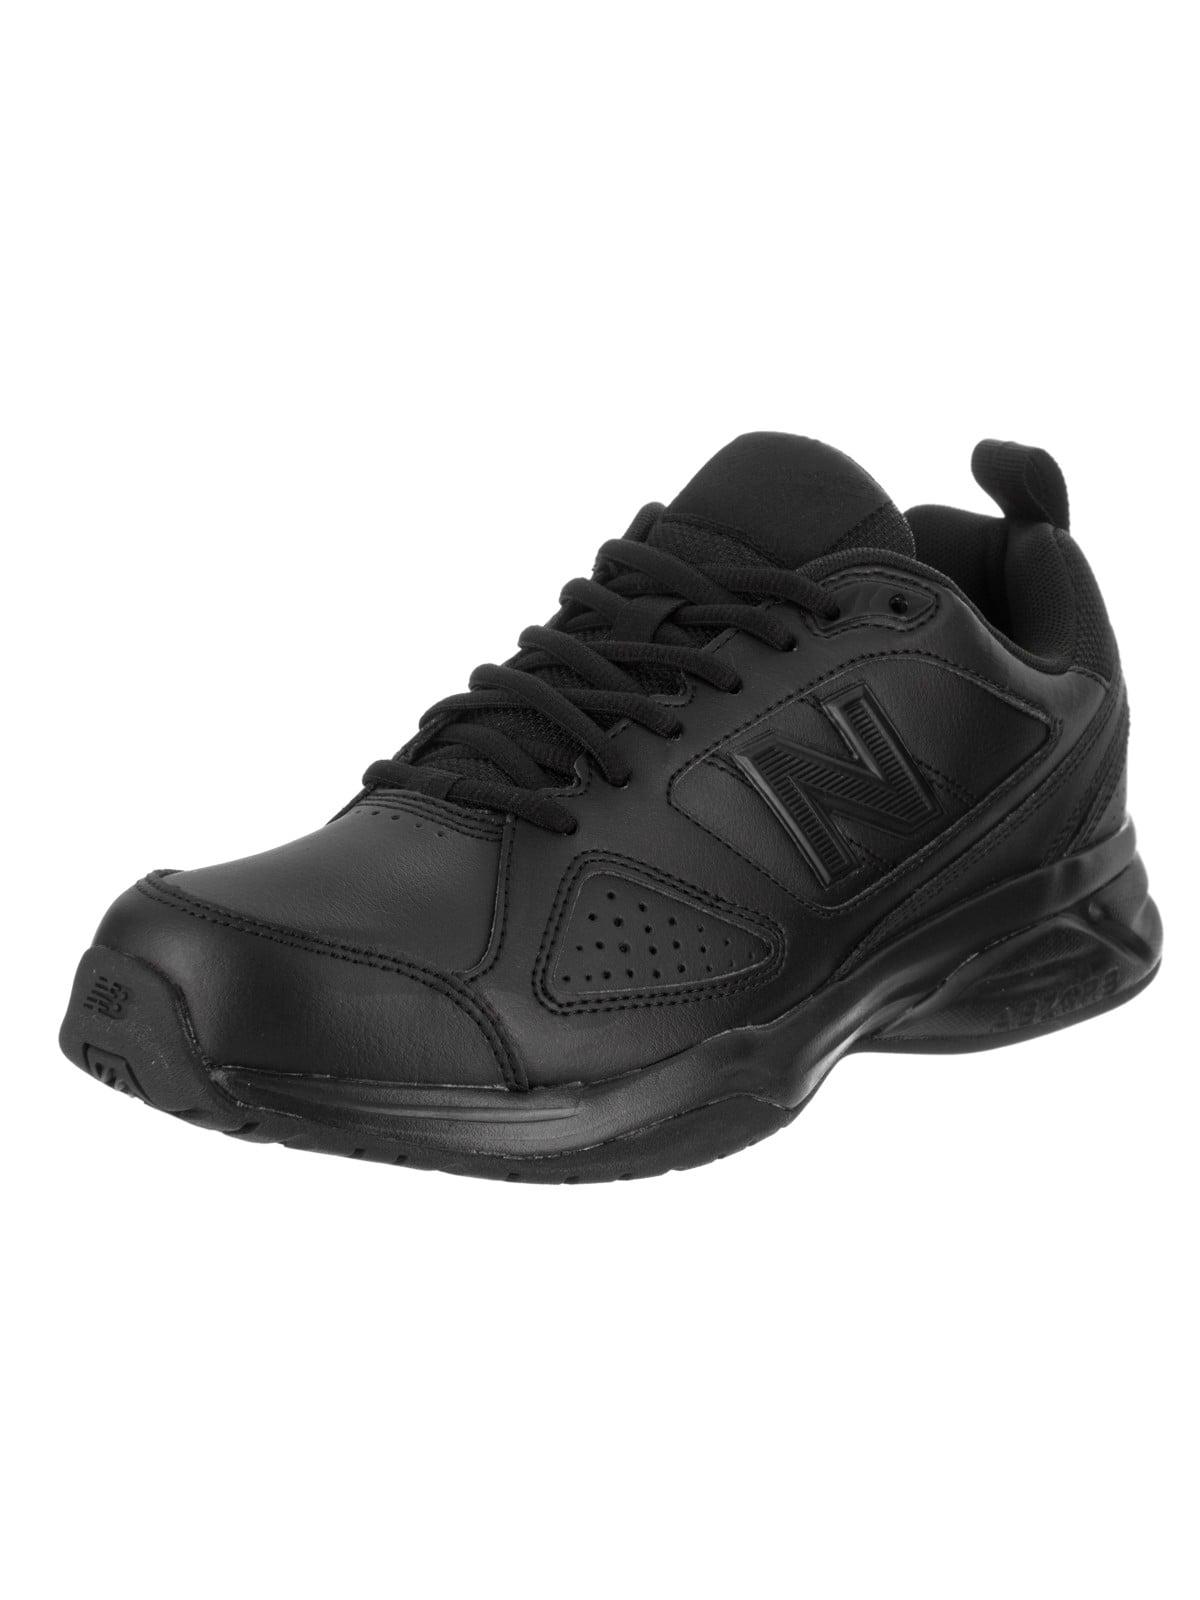 New Balance Men's MX623v3 Training Shoe by New Balance